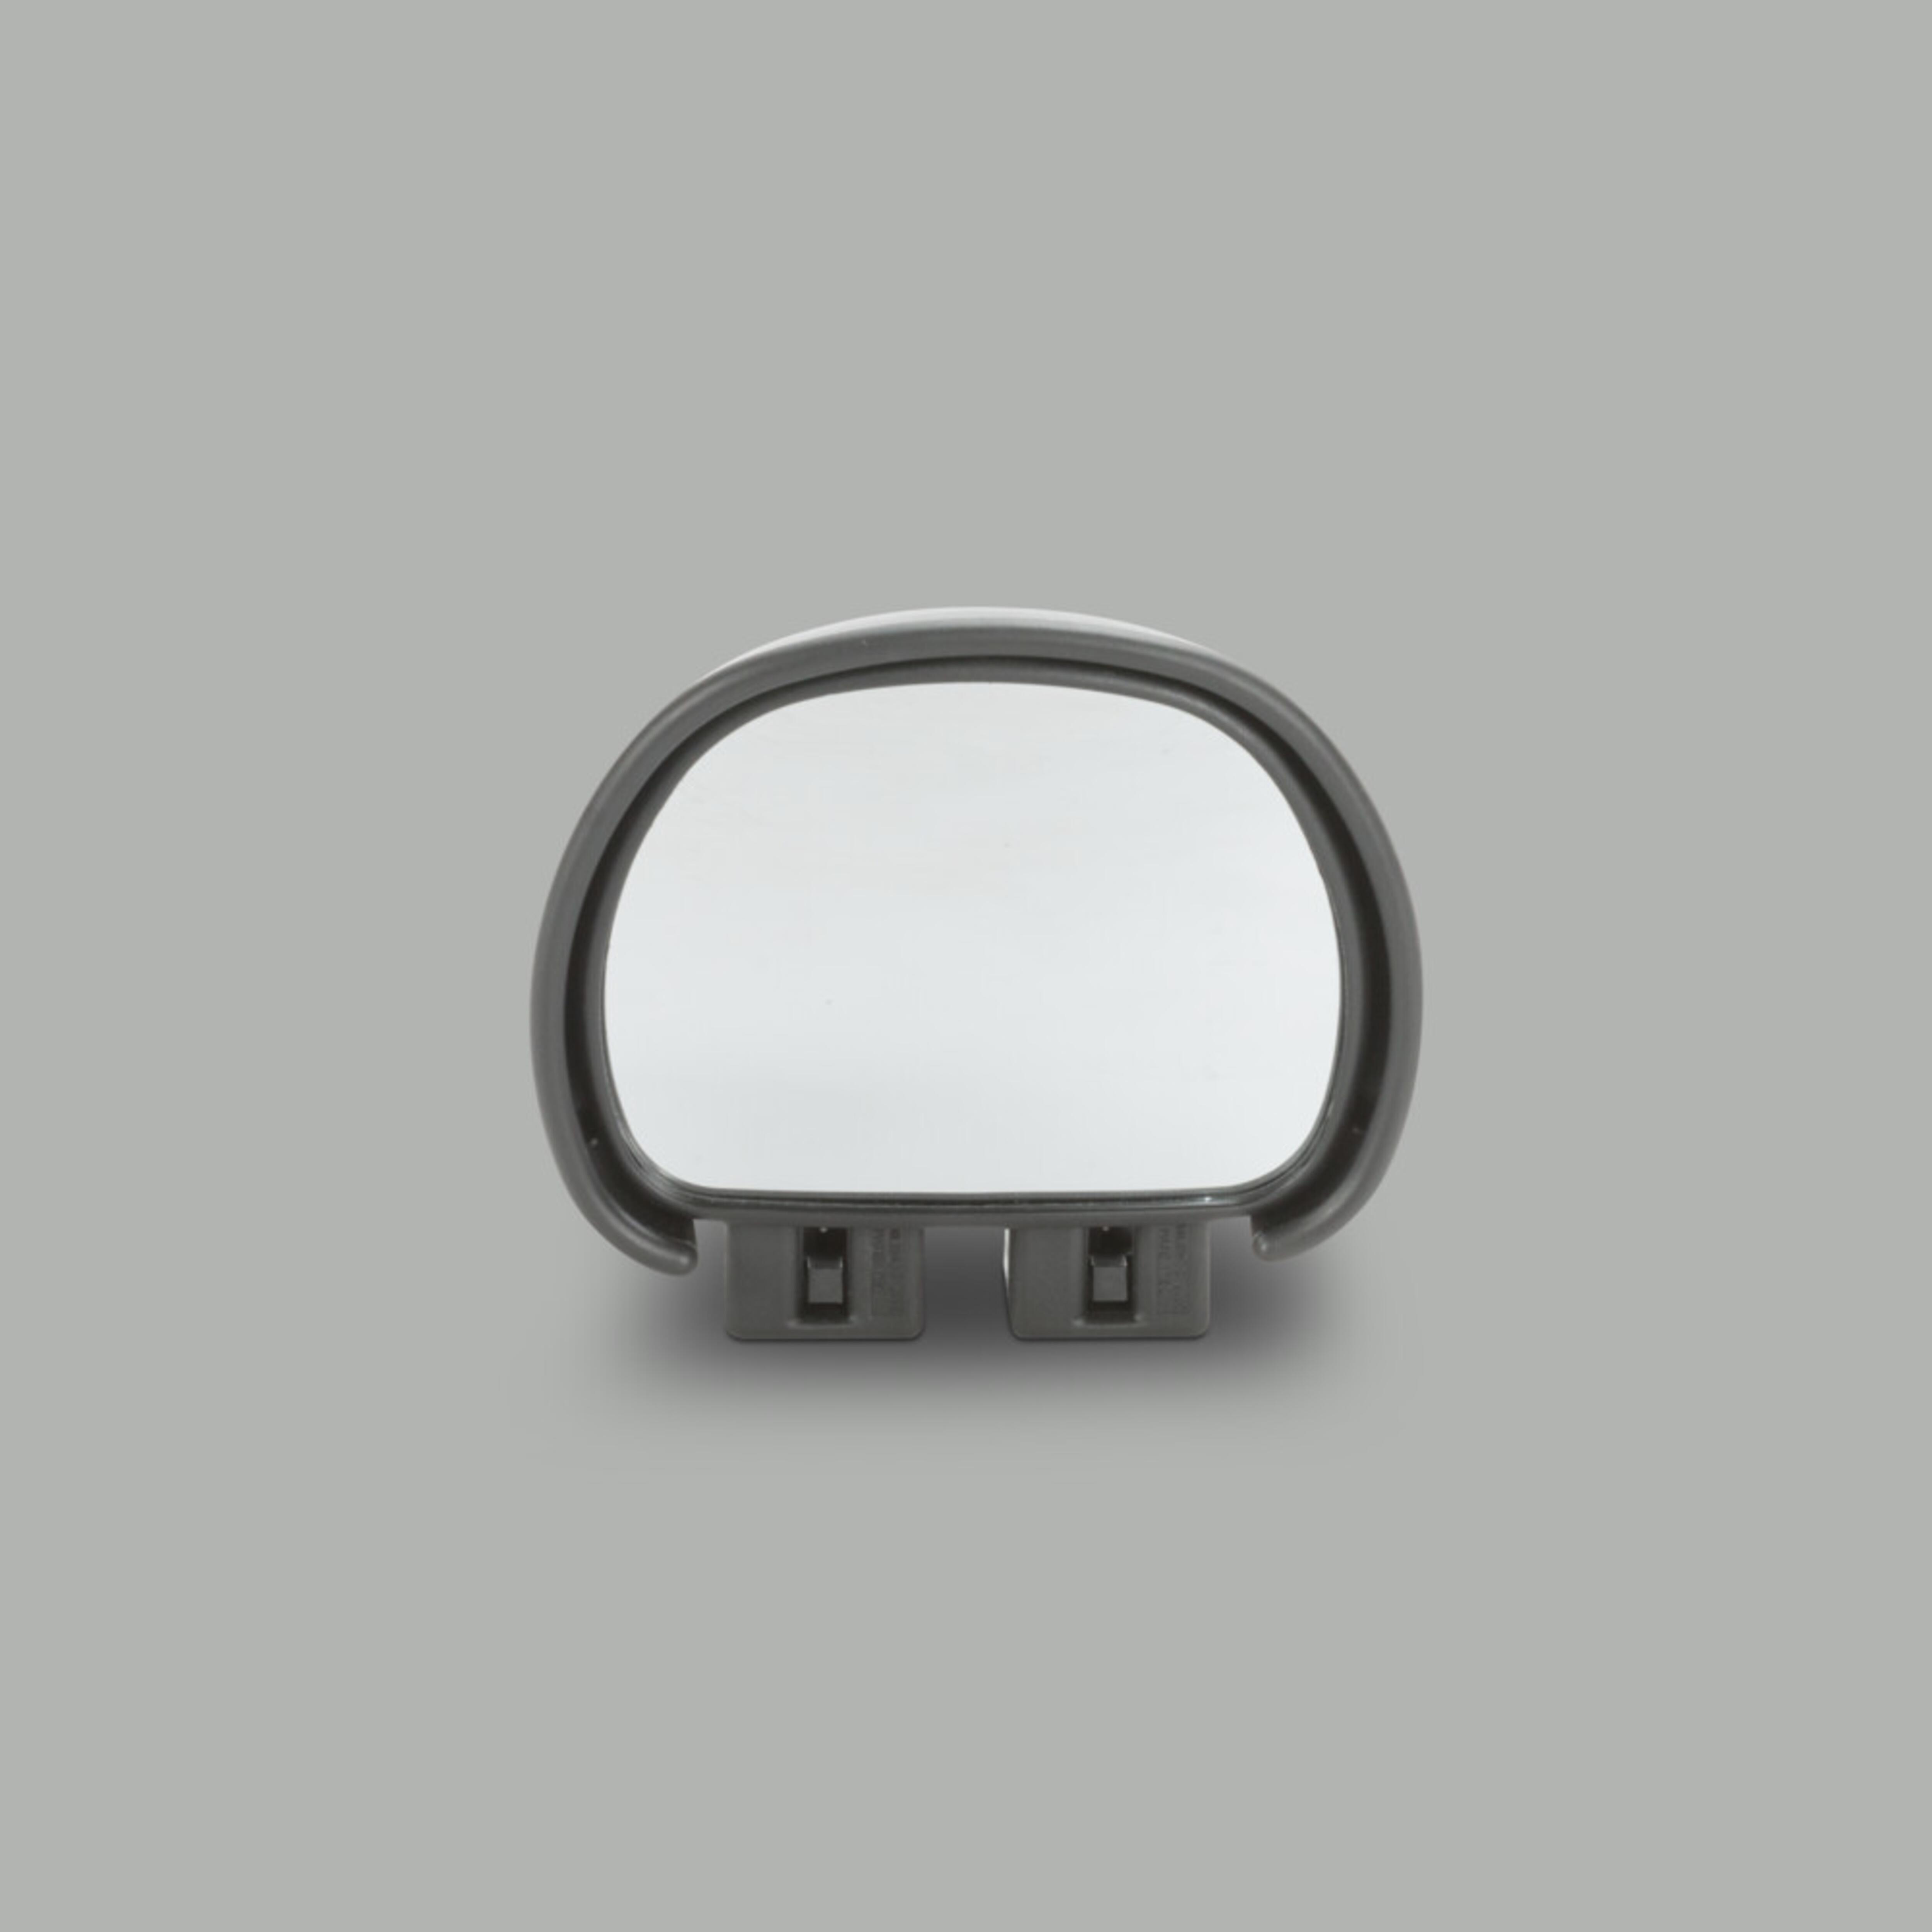 Dometic Milenco Blindspot Mirror